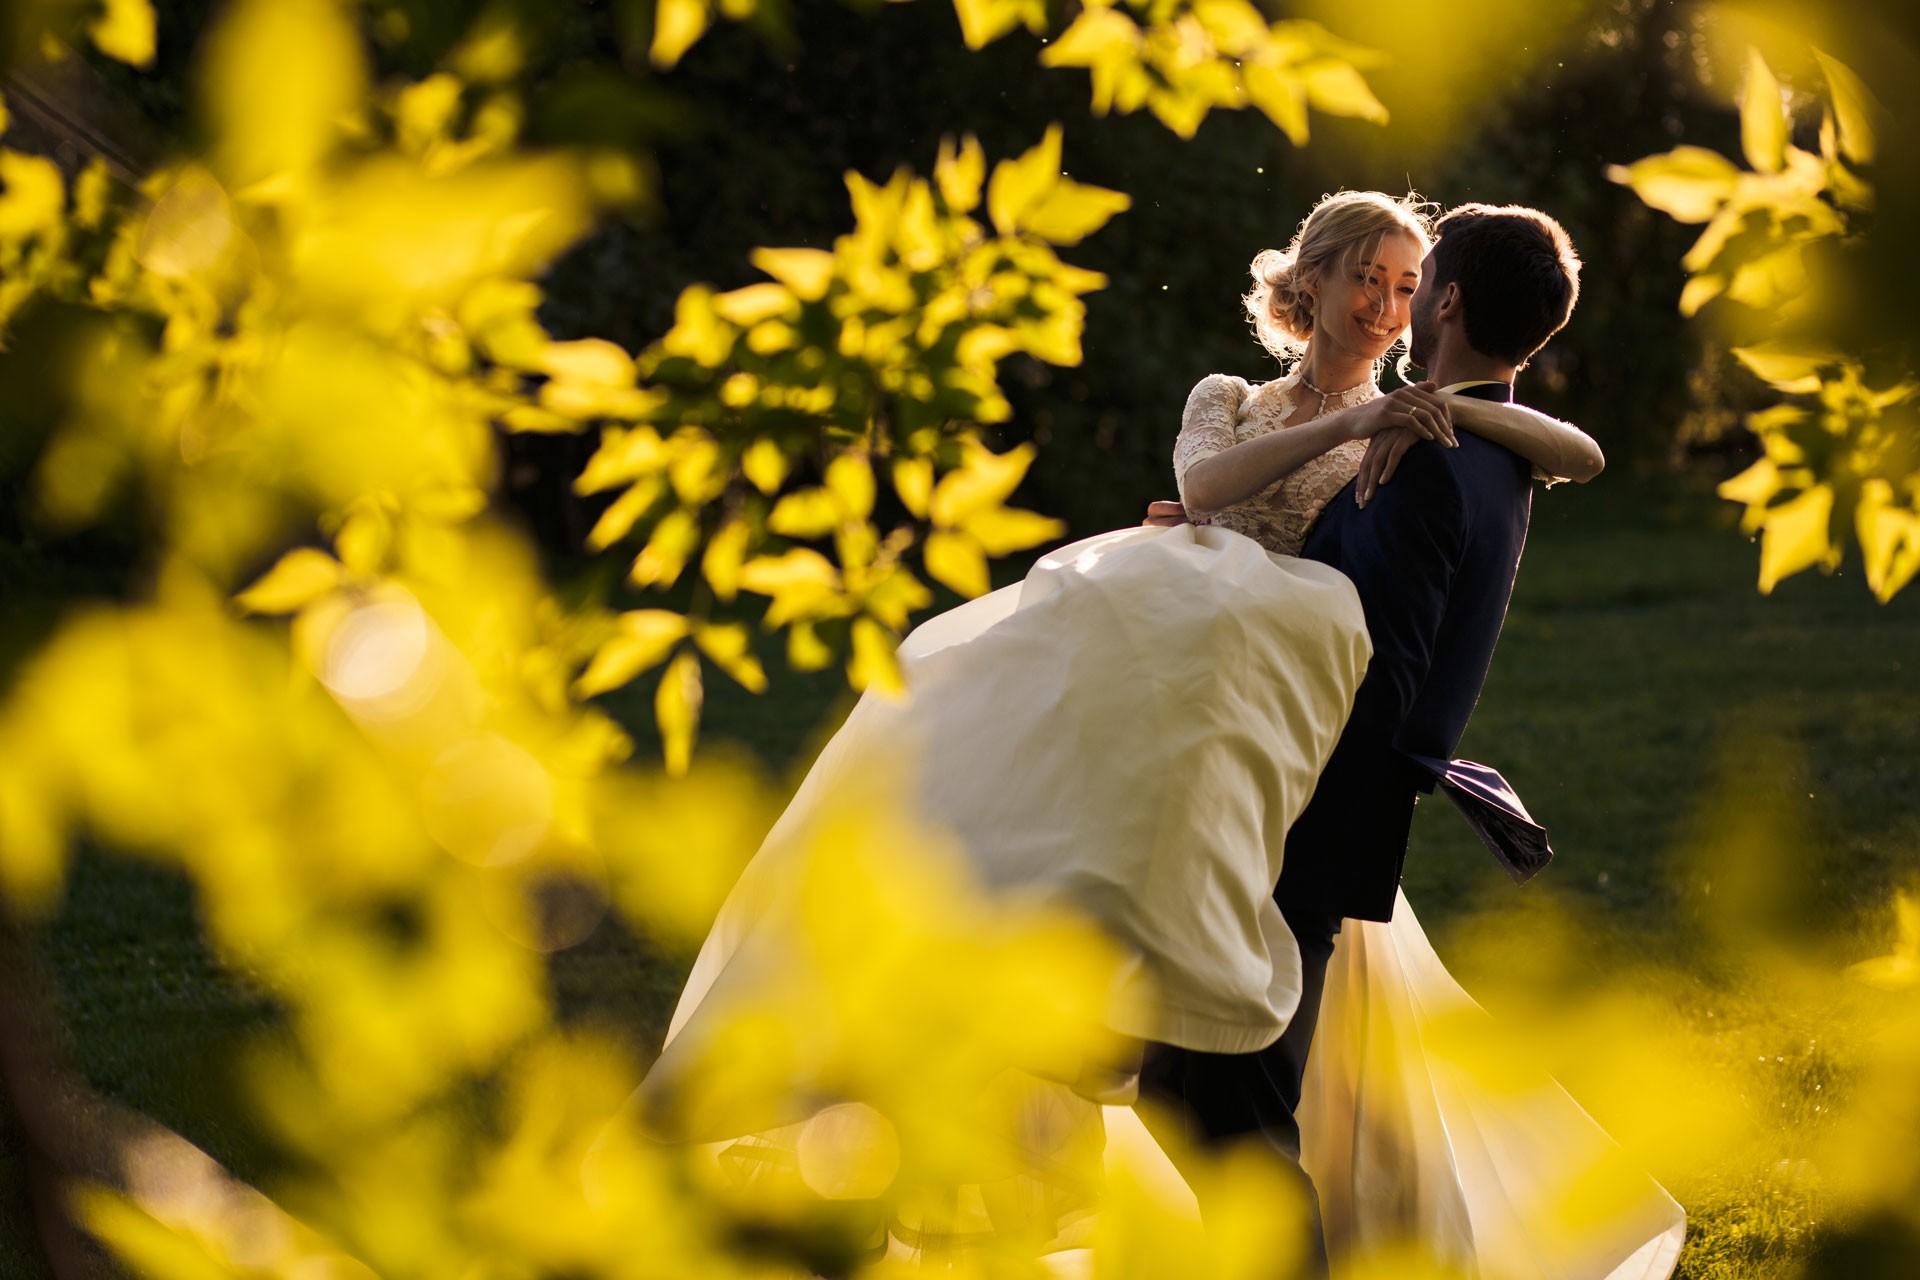 Вишневый сад. Свадьба Валентина Кротова и Натальи Ходуновой фото 12